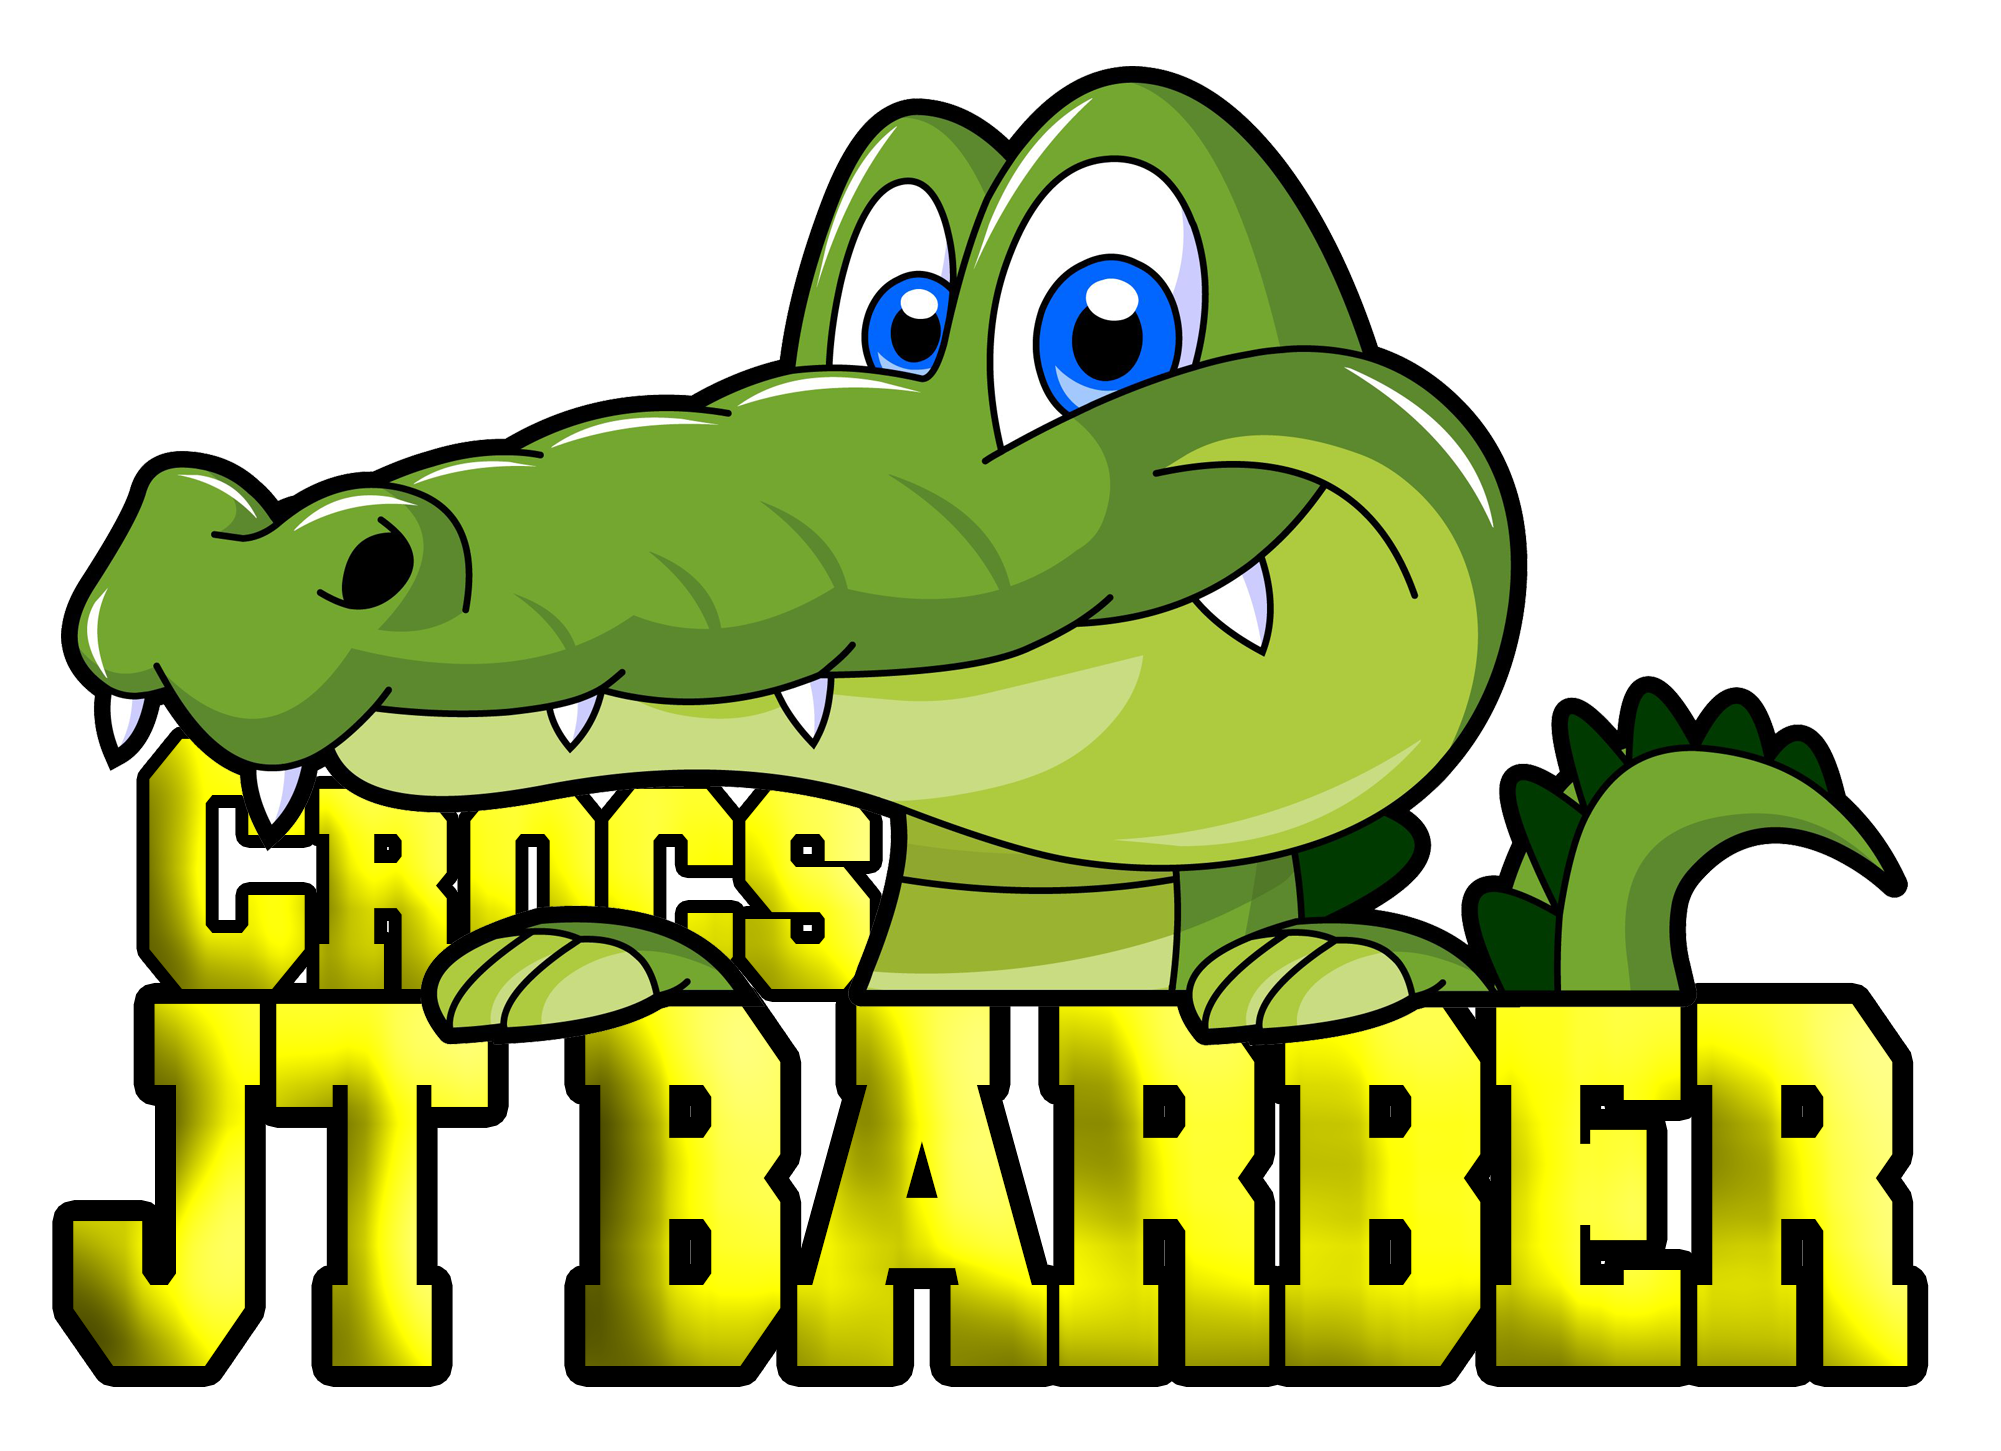 Friendly clipart school google. J t barber elementary